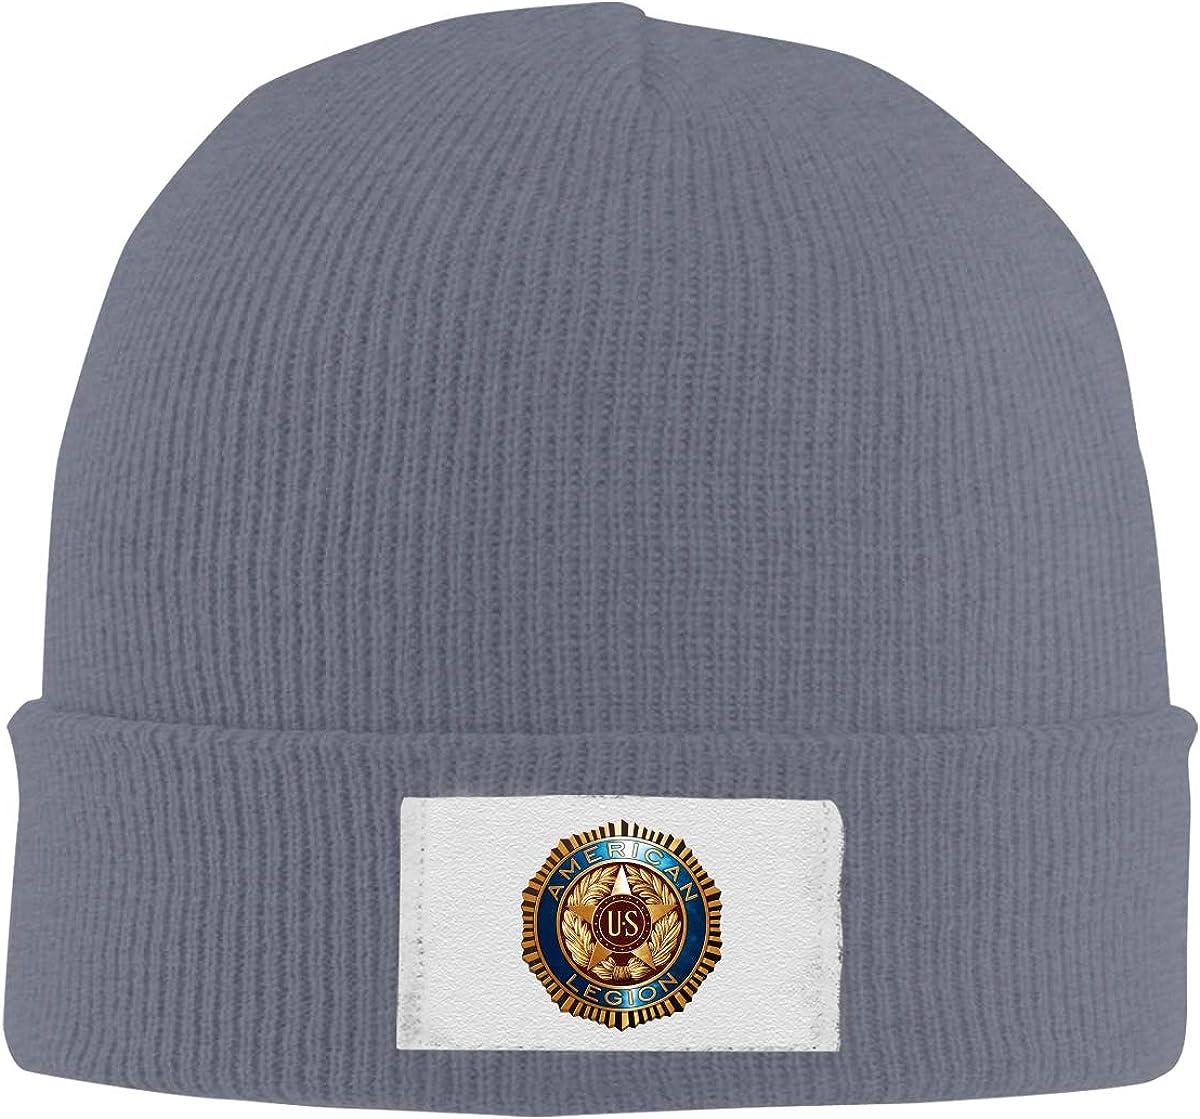 American Legion Logo Top Level Beanie Men Women Unisex Stylish Slouch Beanie Hats Black